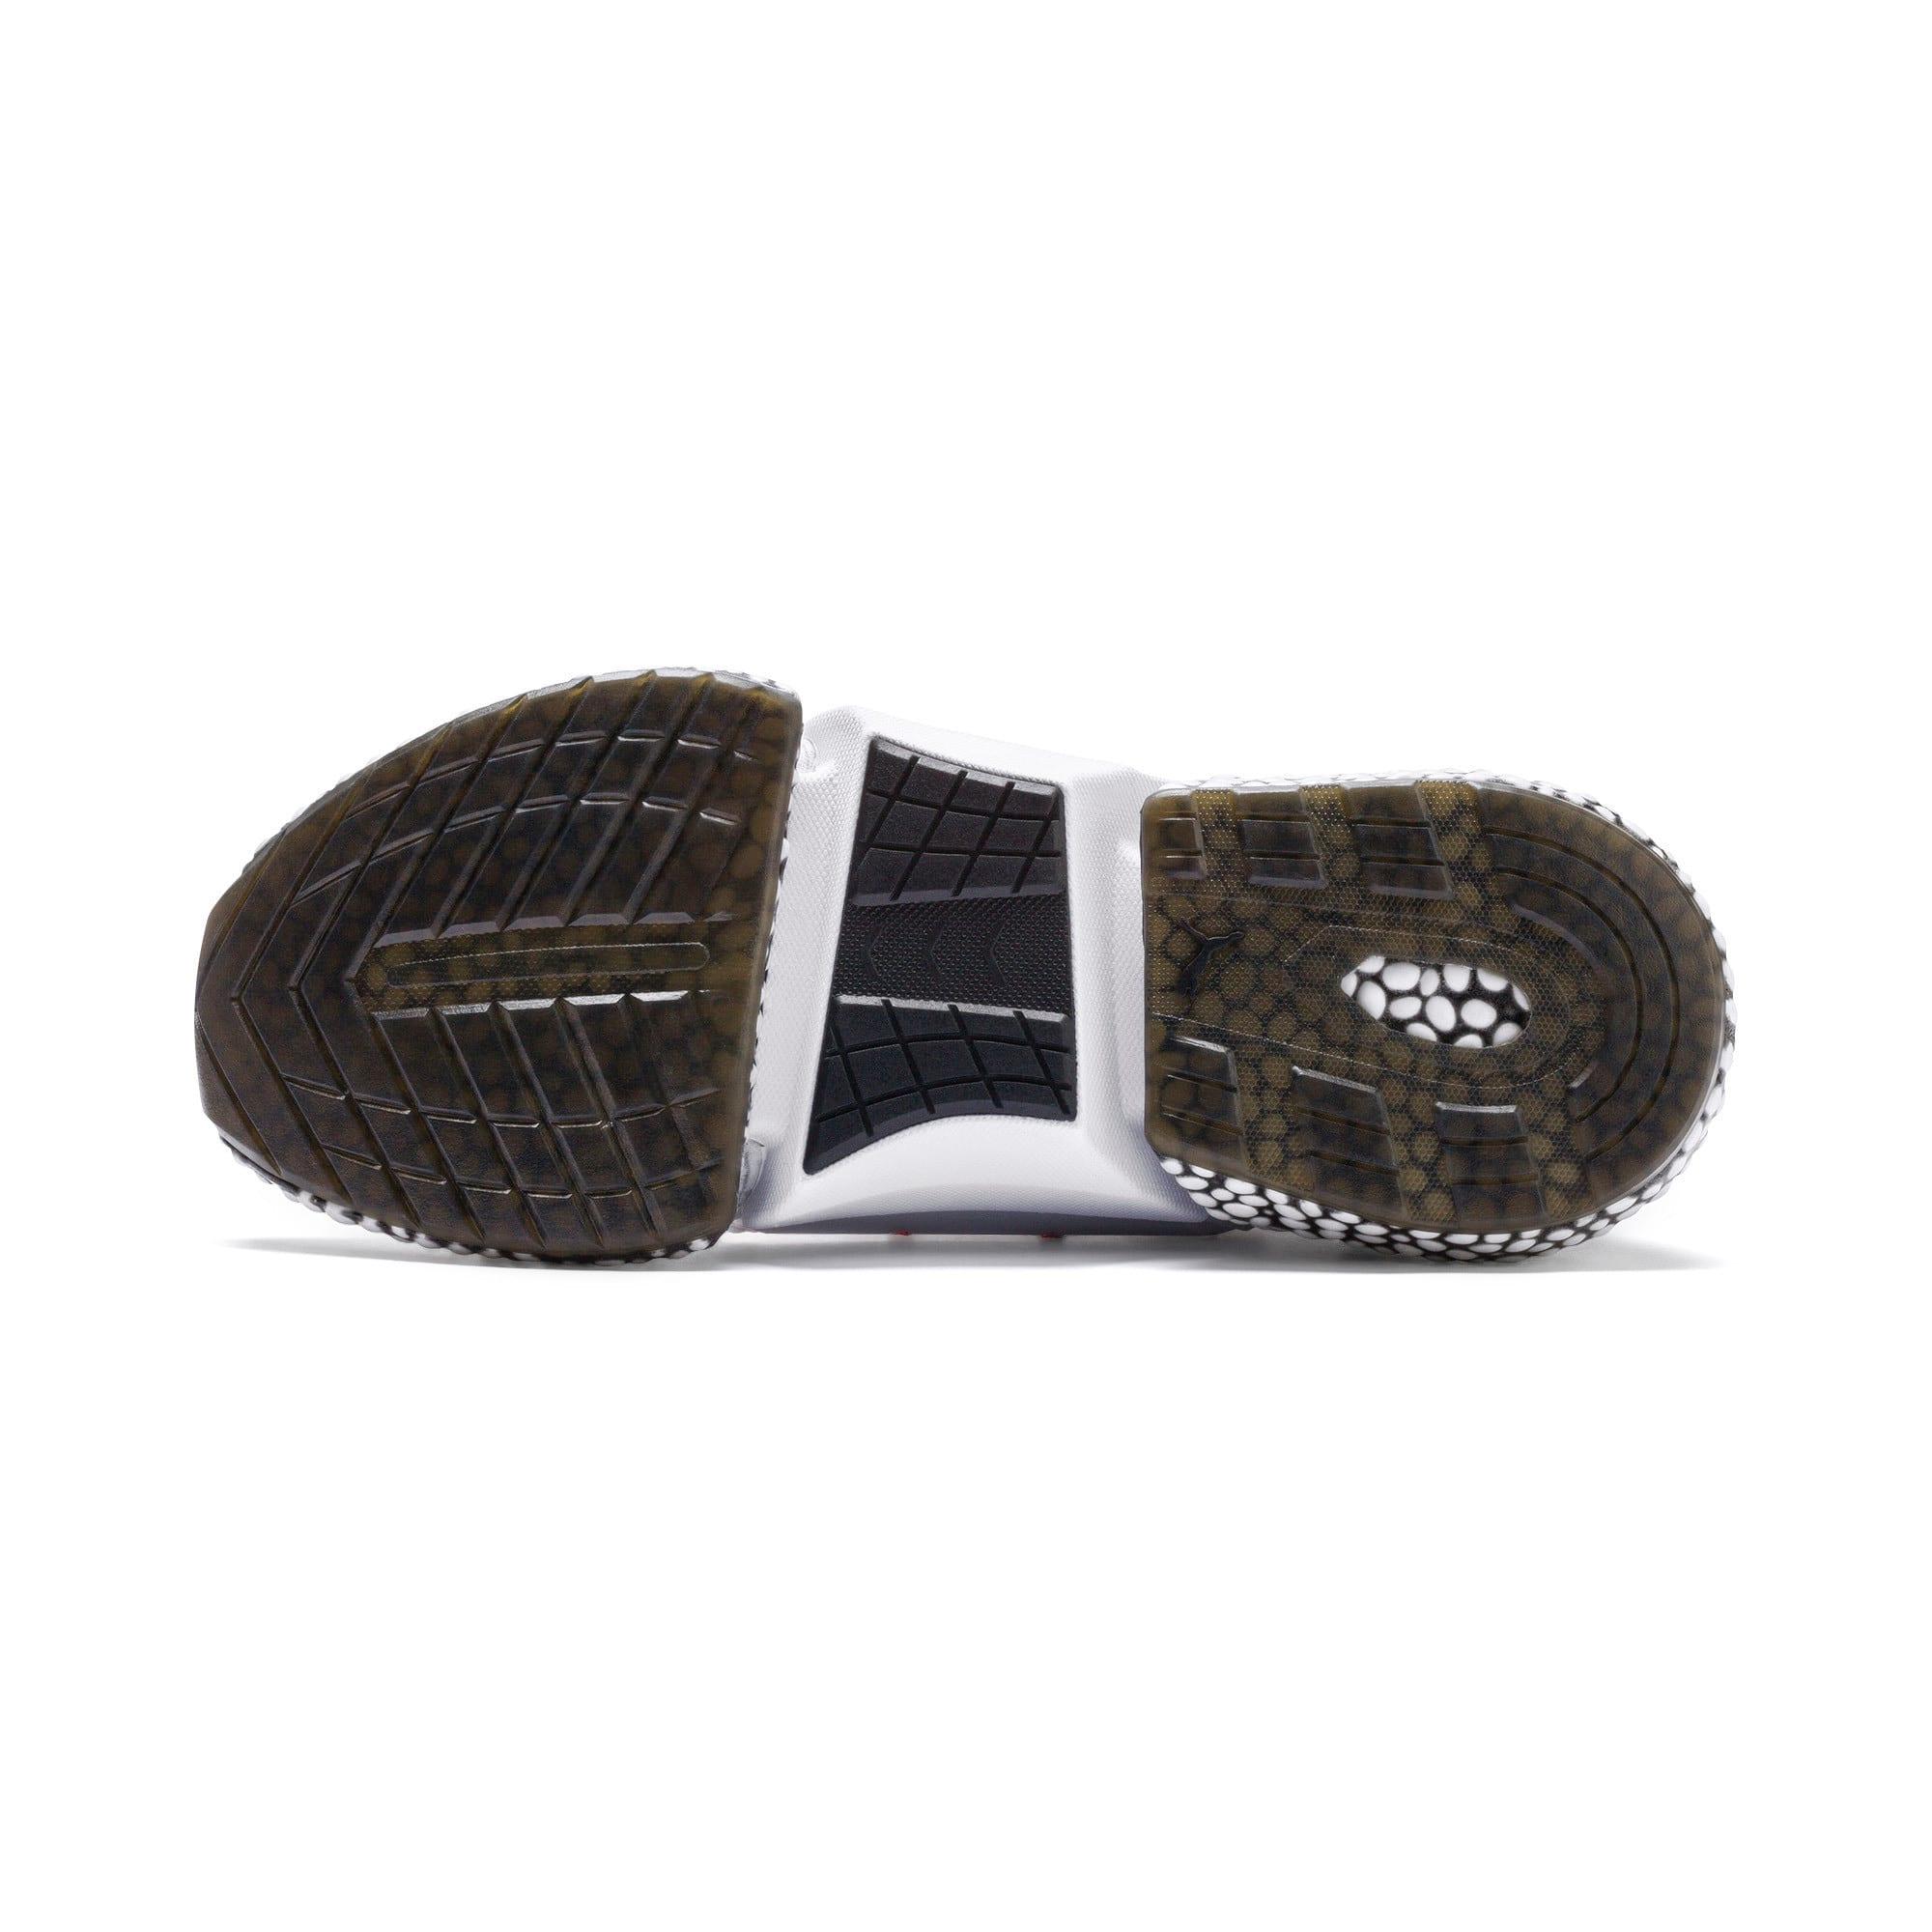 Thumbnail 5 of HYBRID Rocket Aero Men's Sneakers, Puma White-Puma Black, medium